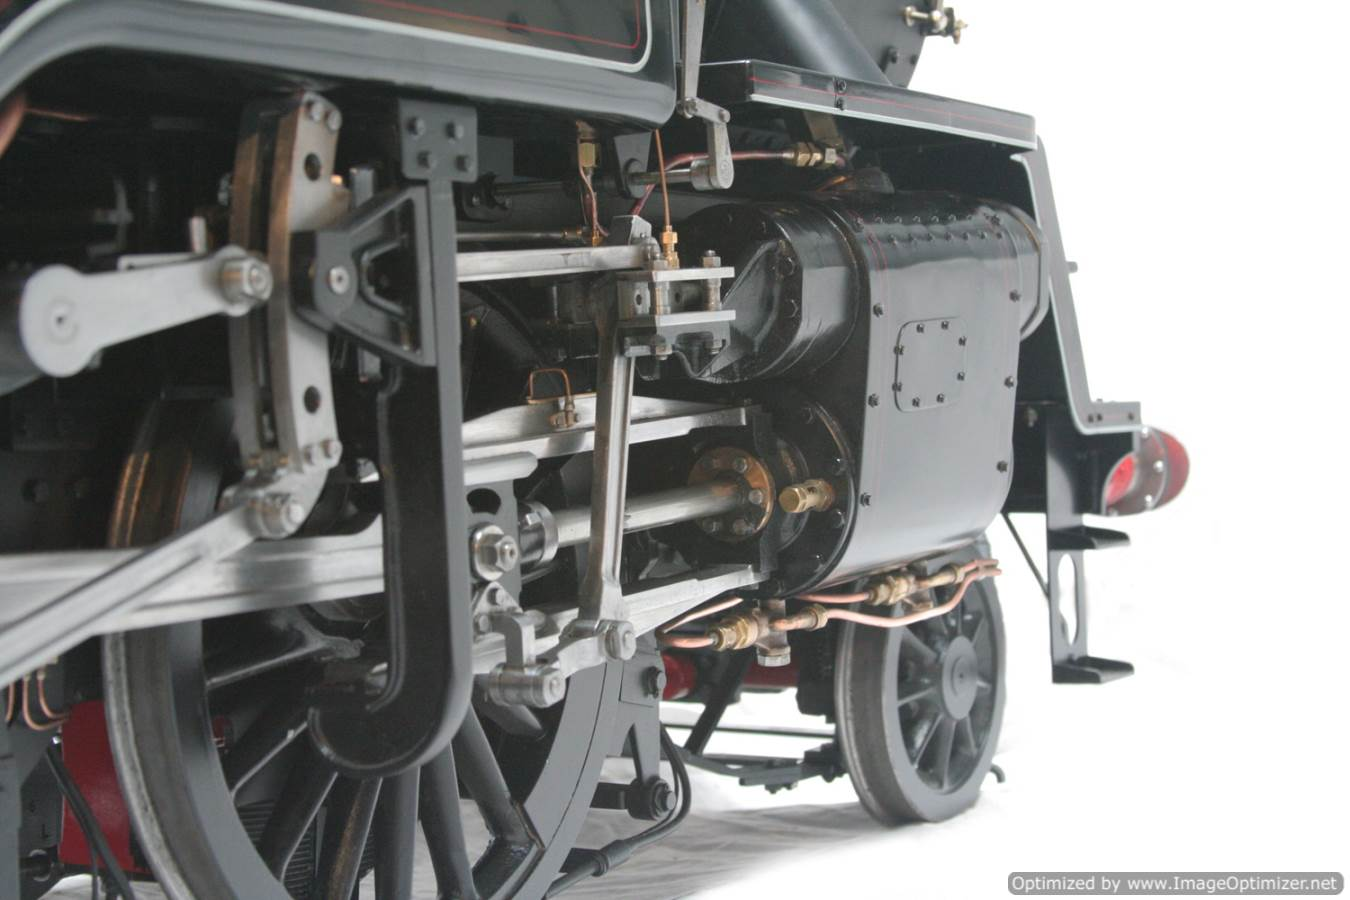 test br-standard-class-4-tank-live-steam-model-steam-workshop-rebuild-31-optimized